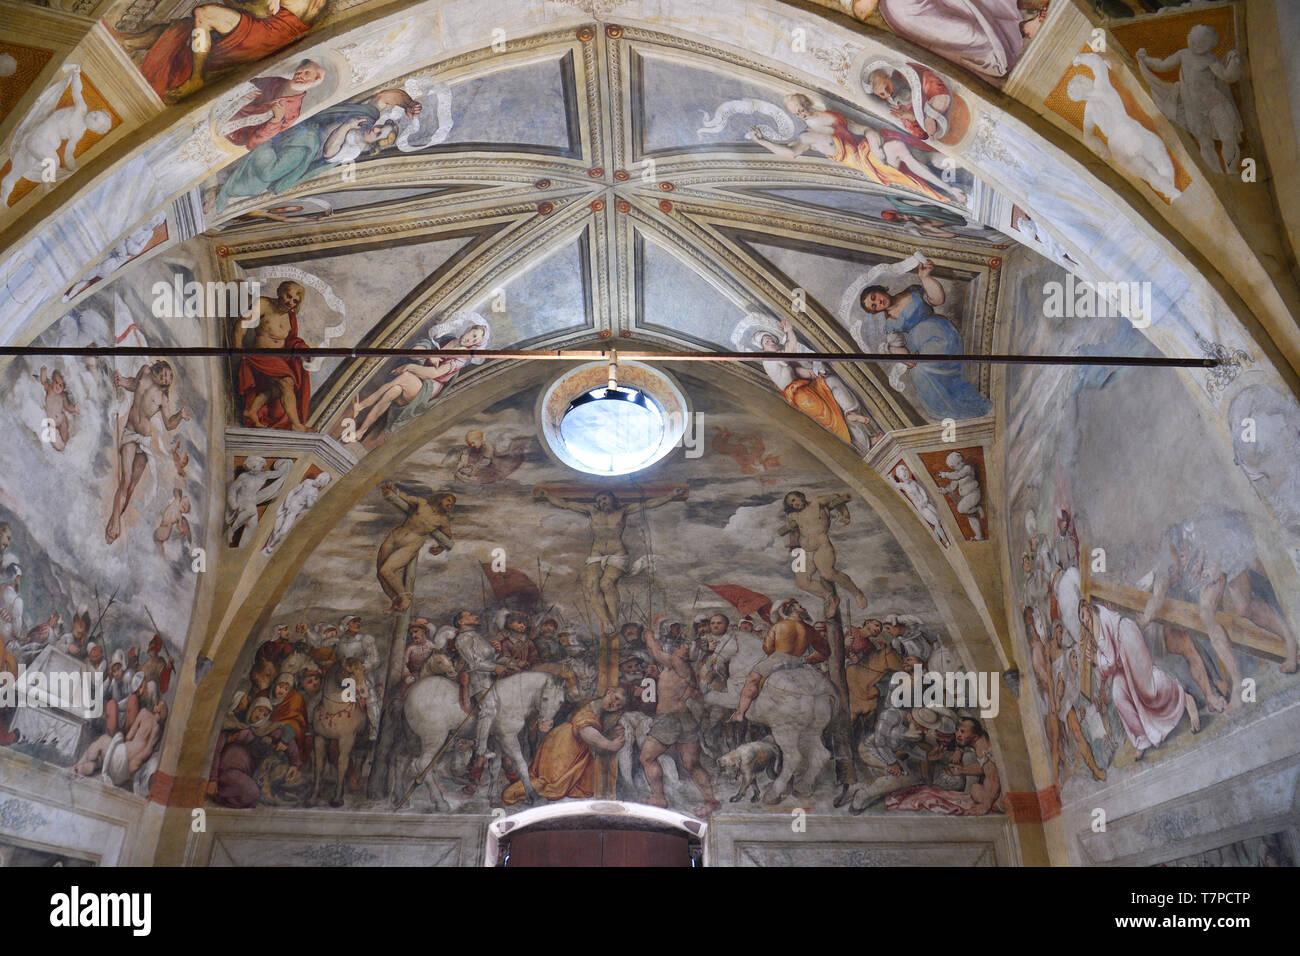 Italy, Lombardy, Iseo lake (Il Lago d'Iseo), Pisogne, Santa Maria della Neve, Frescos by Girolamo Romani says Romanino in 1534 - Stock Image